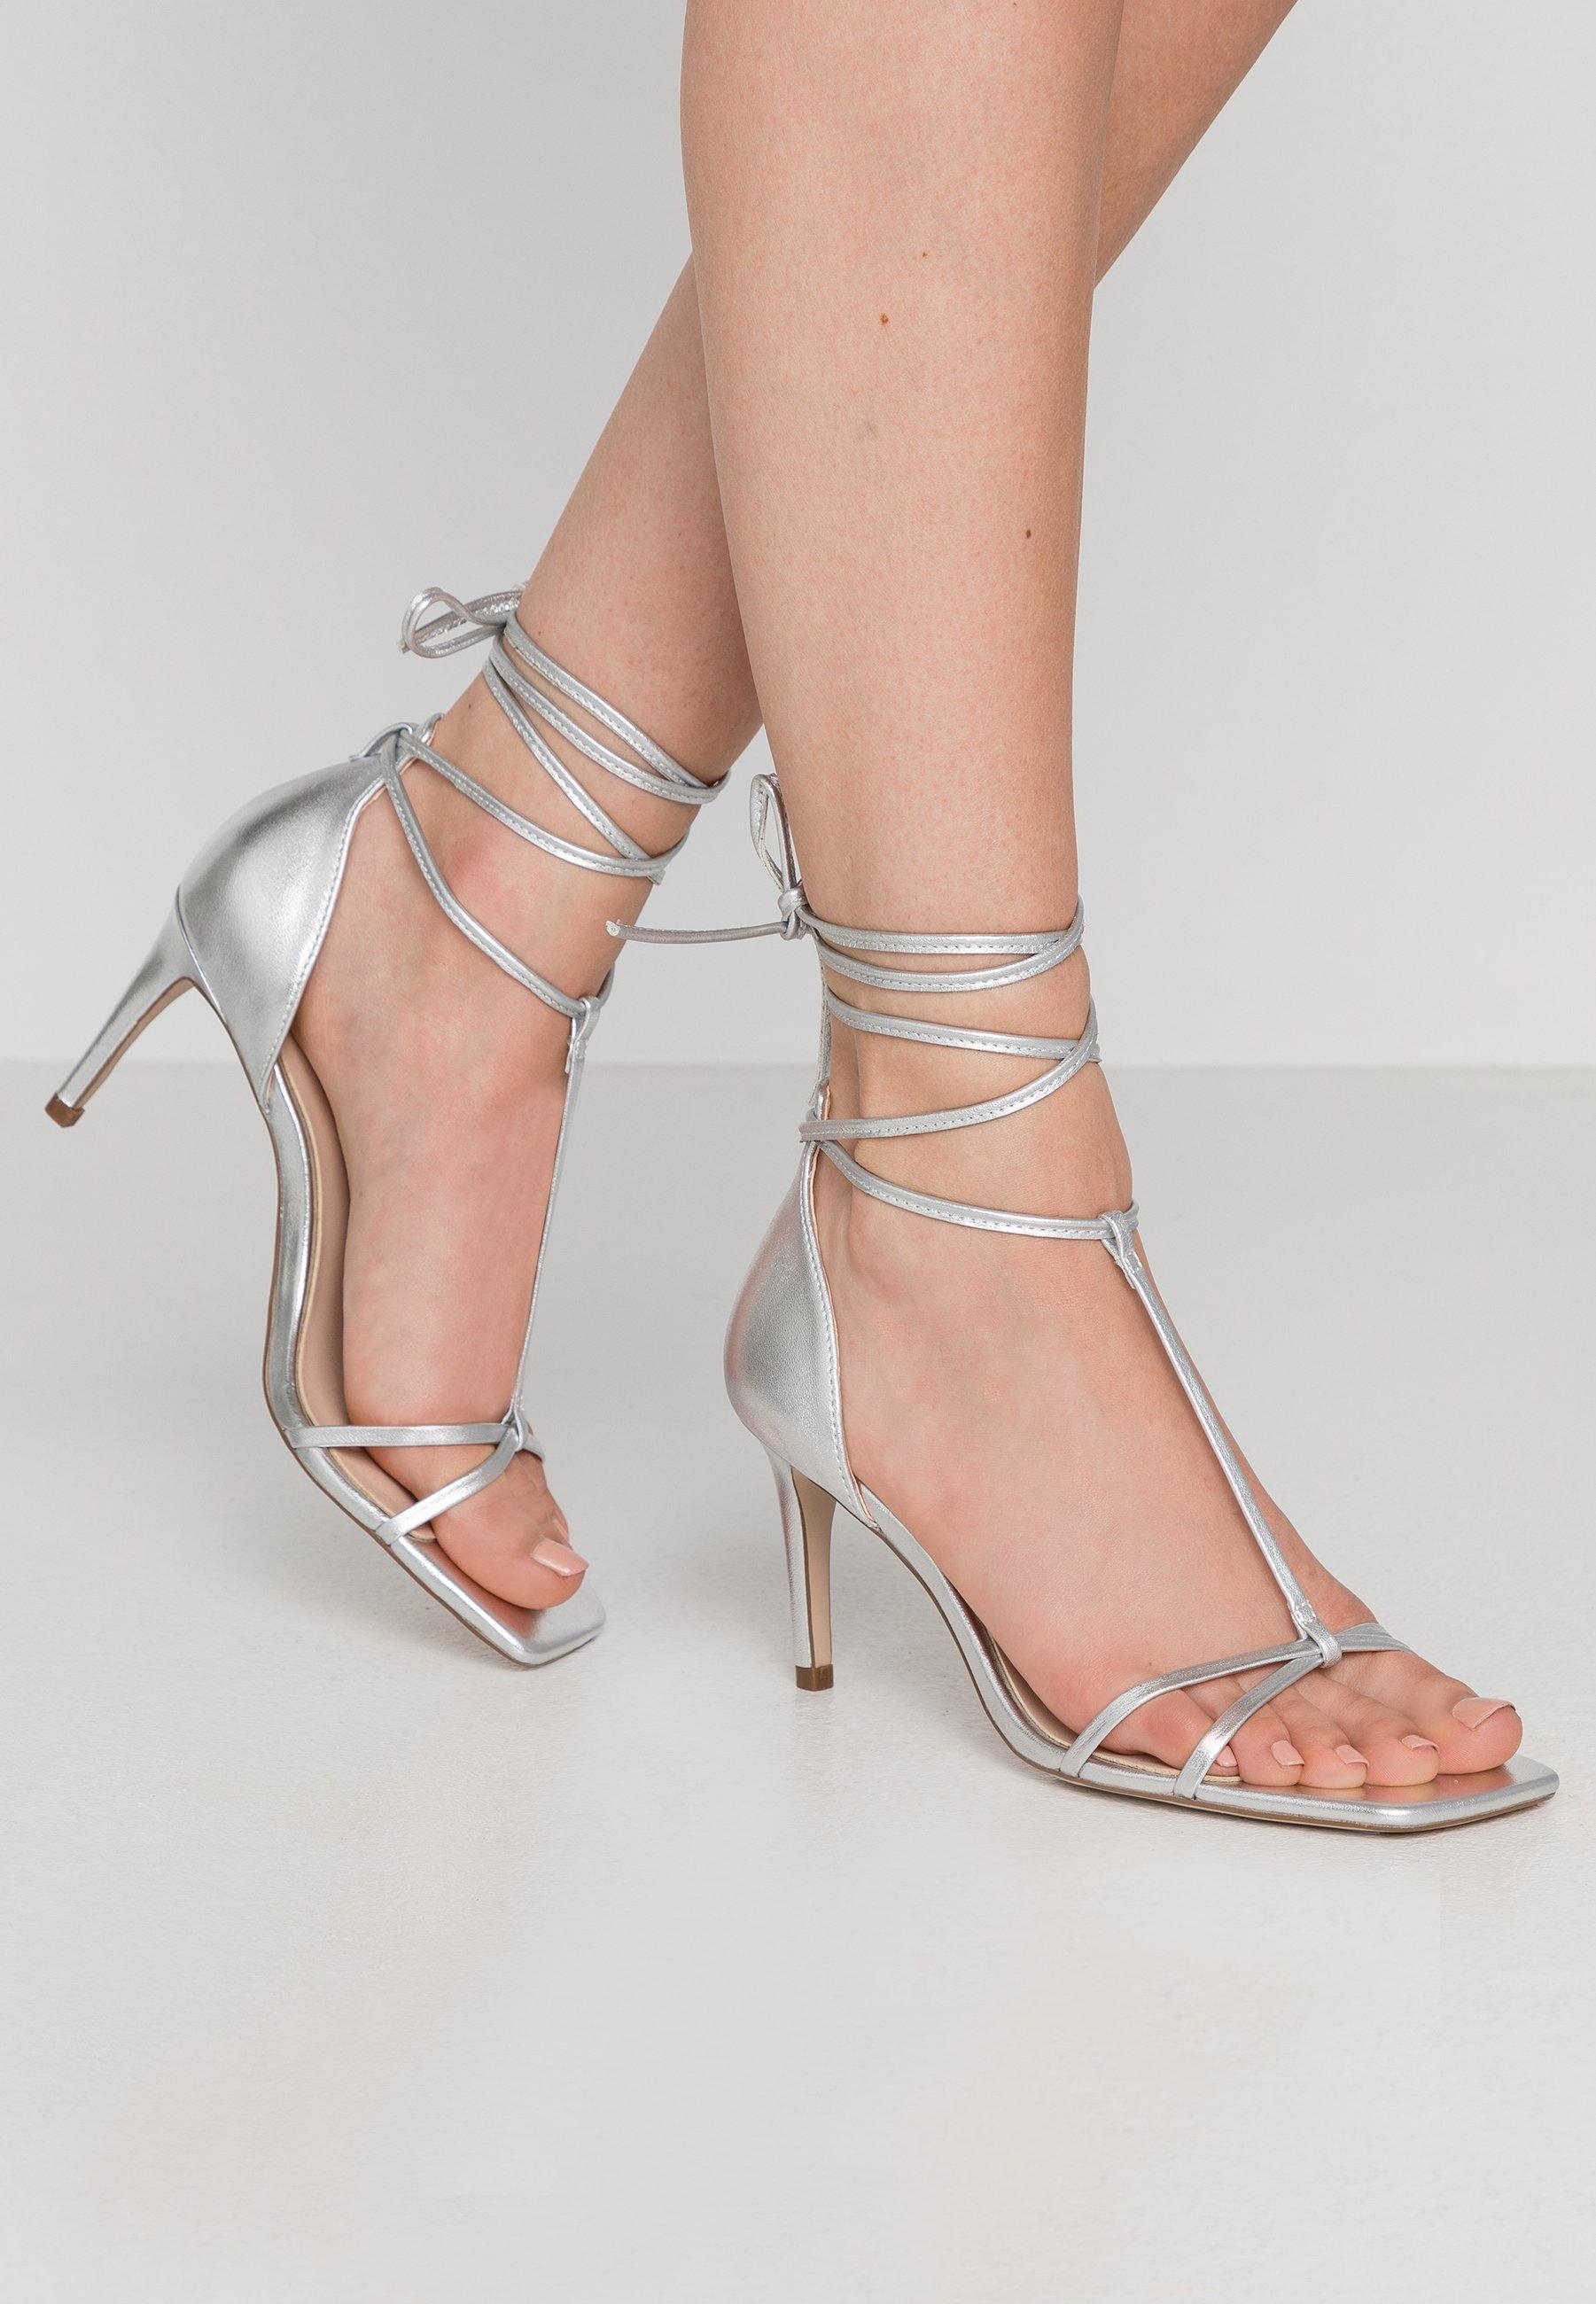 Damen High Heel Sandalette - silver